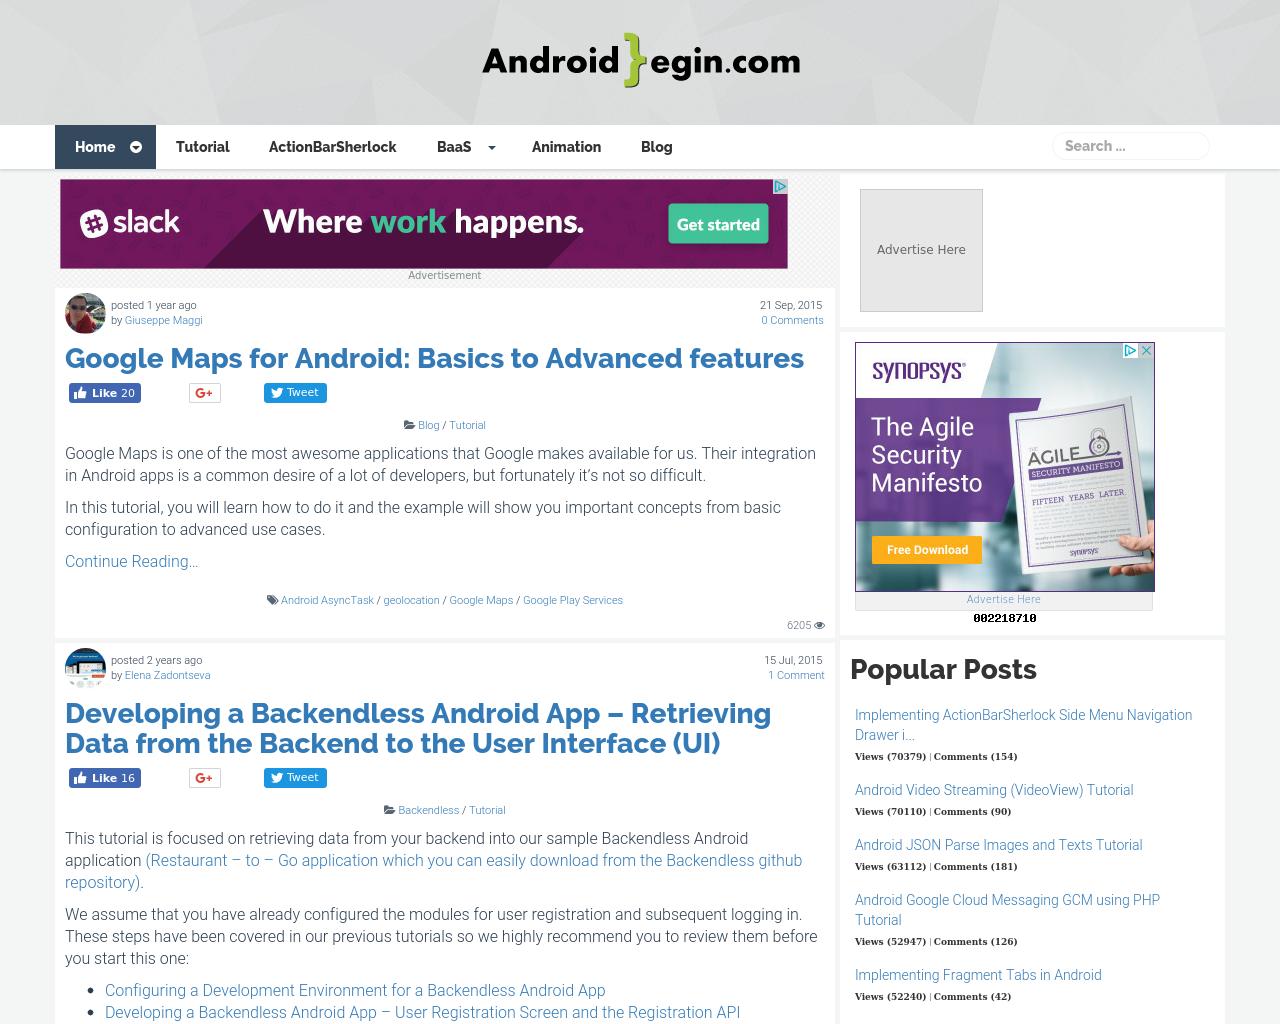 AndroidBegin.com-Advertising-Reviews-Pricing